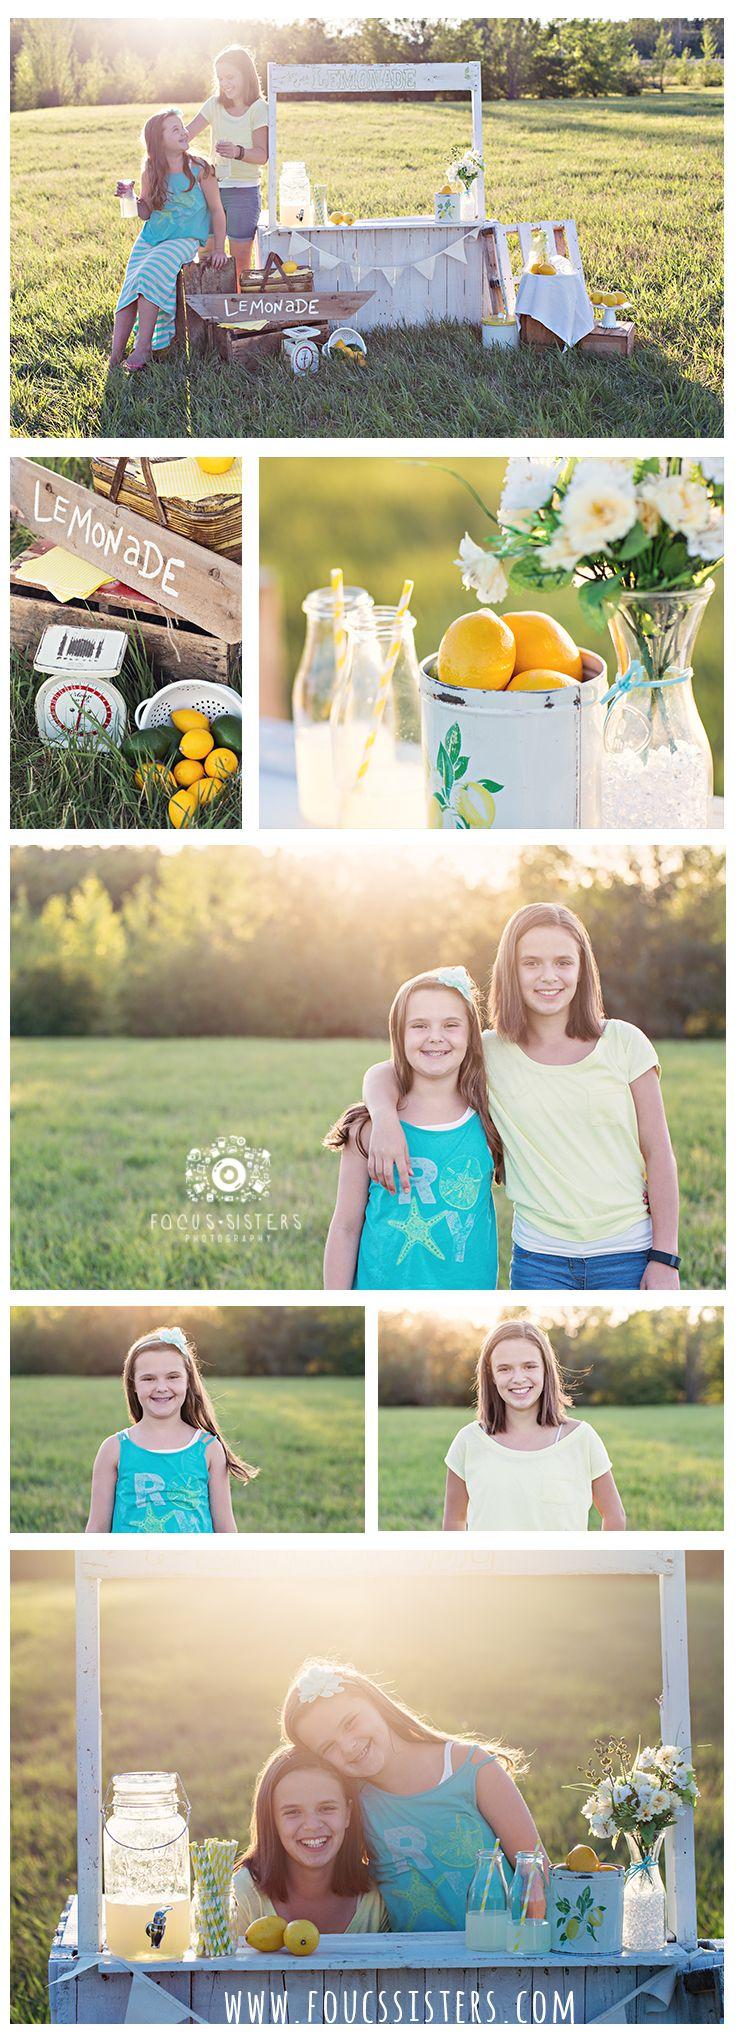 Lemonade Stand Mini Session | Calgary Alberta | Focus Sisters Photography | Child Photography